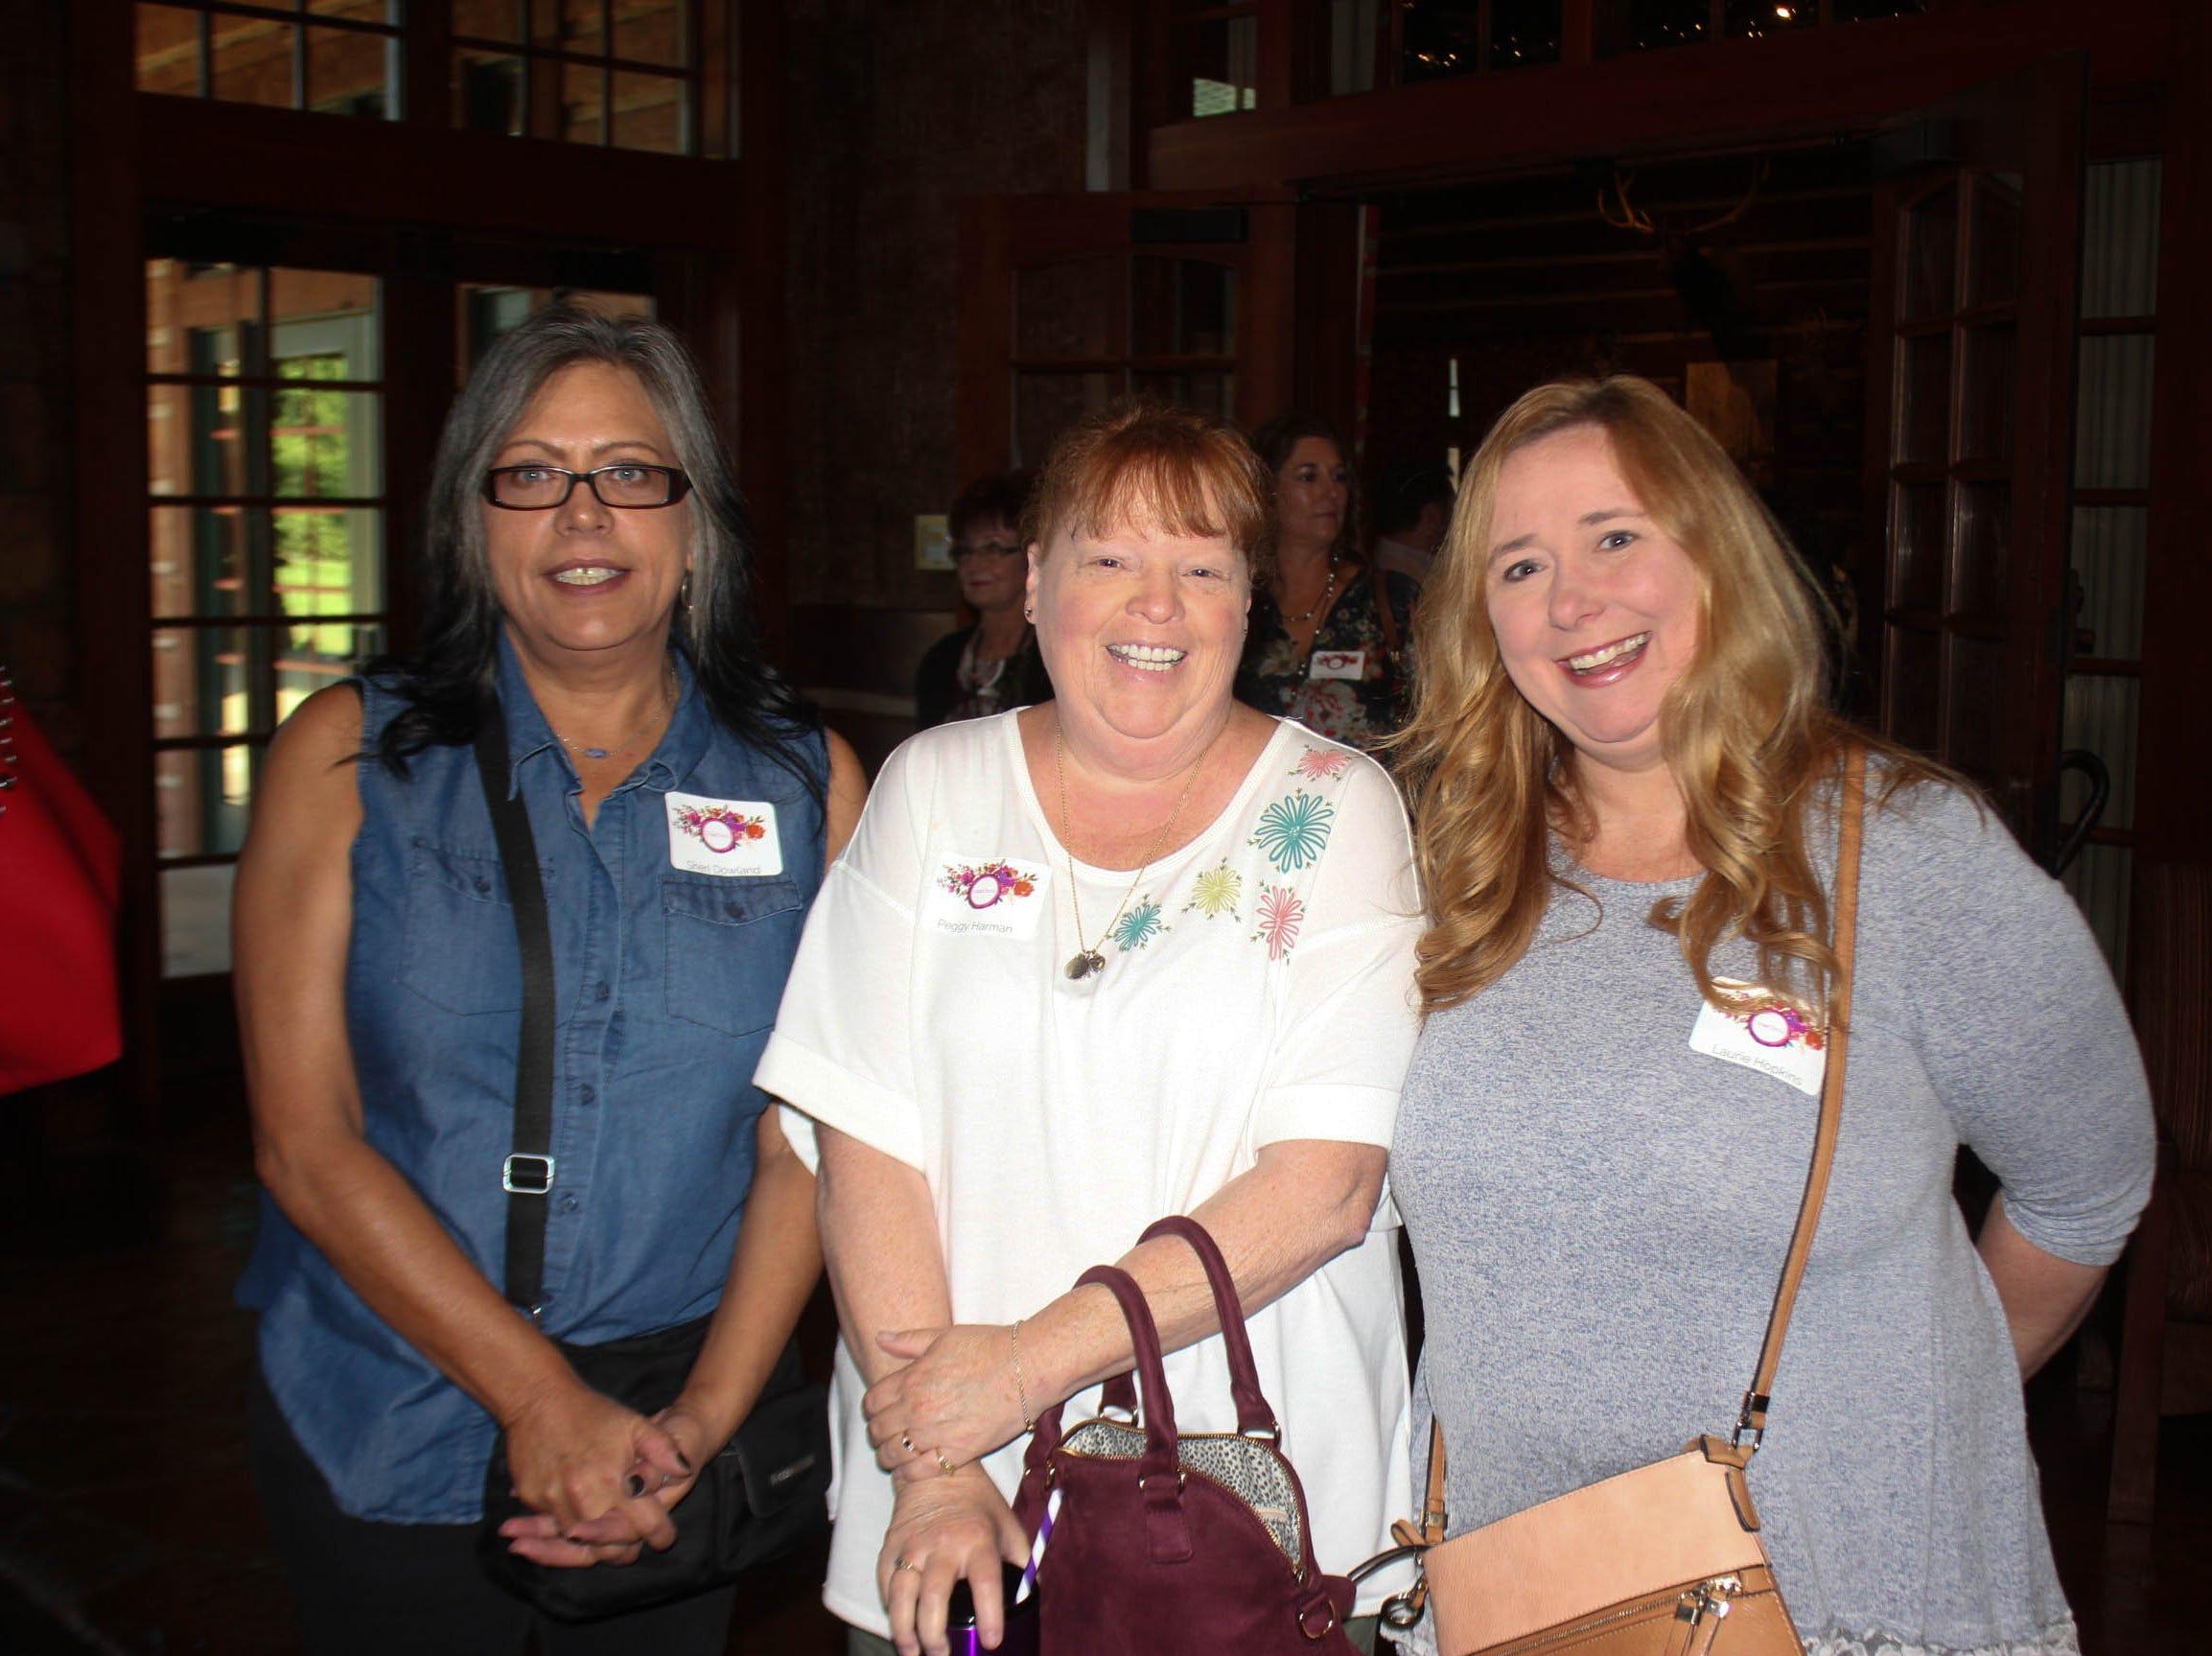 Sheri Dowland, Peggy Harmond and Lauria Hopkins